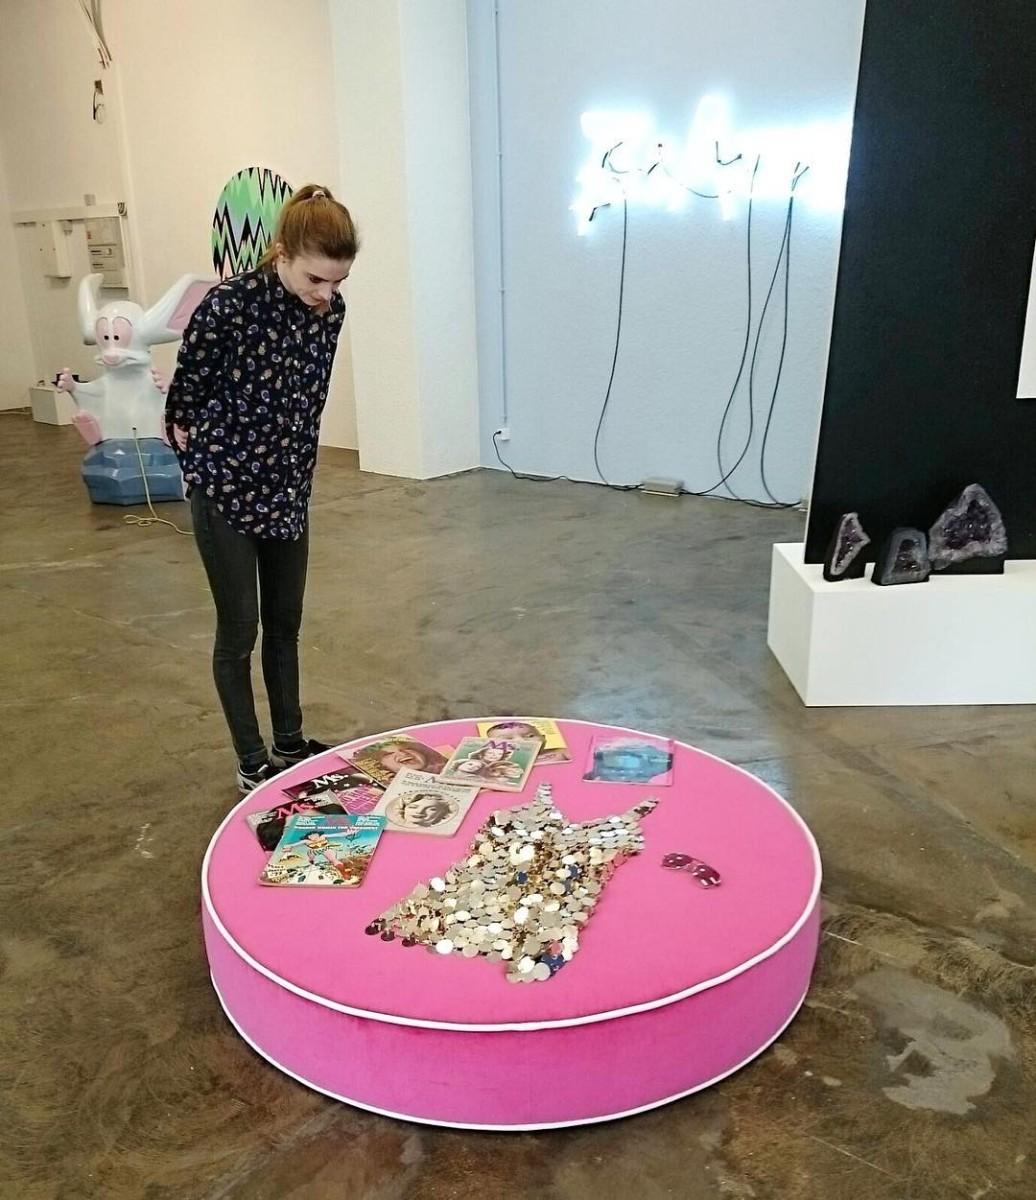 #atelier #collaboration #Ms. #artist #sylviefleury #artcontemporain #galerie #karmainternational #zürich